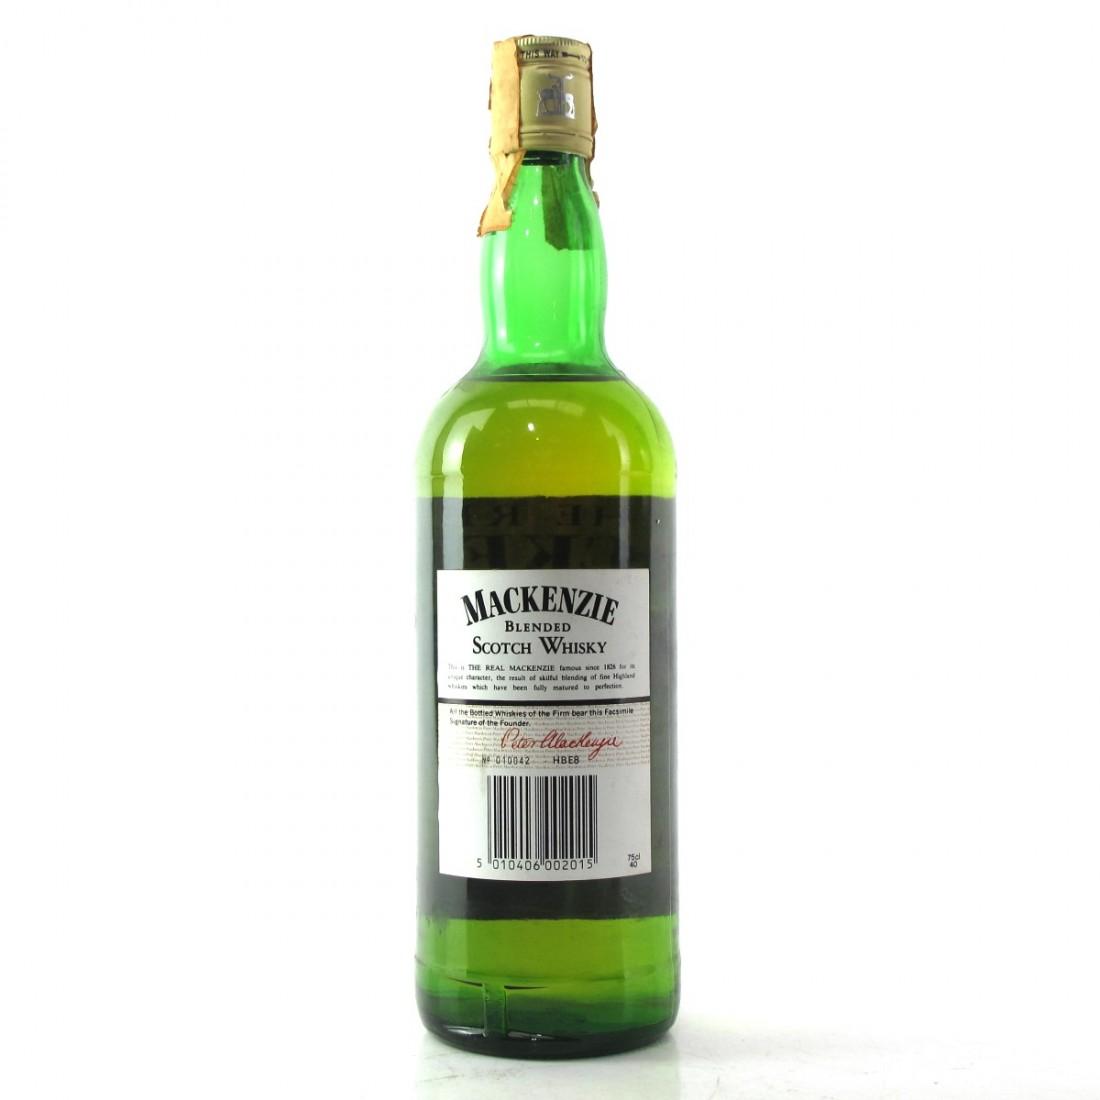 Real MacKenzie 5 Year Old Scotch Whisky 1980s